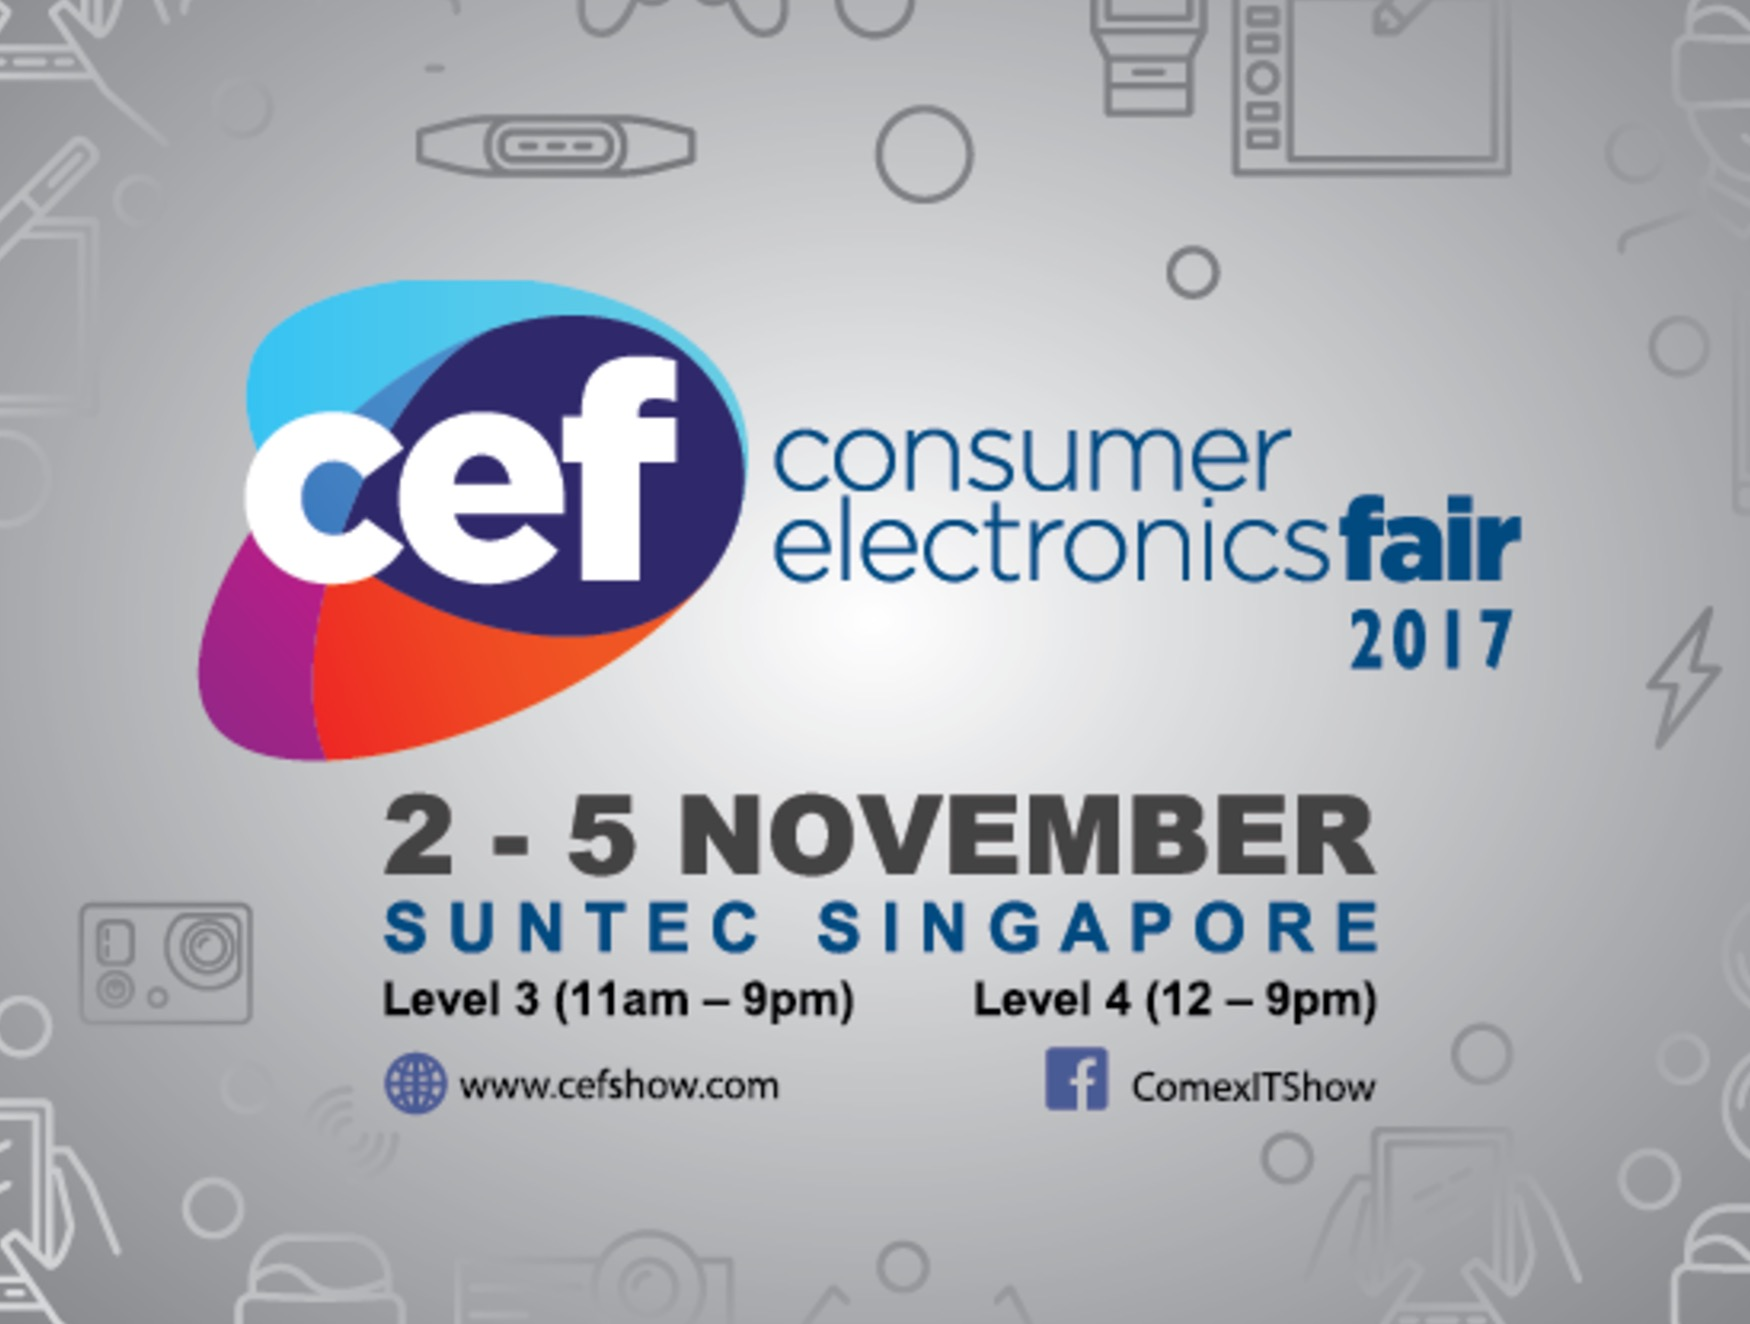 CEF Consumer Electronics Fair 2017 | 2-5 November | Suntec Singapore